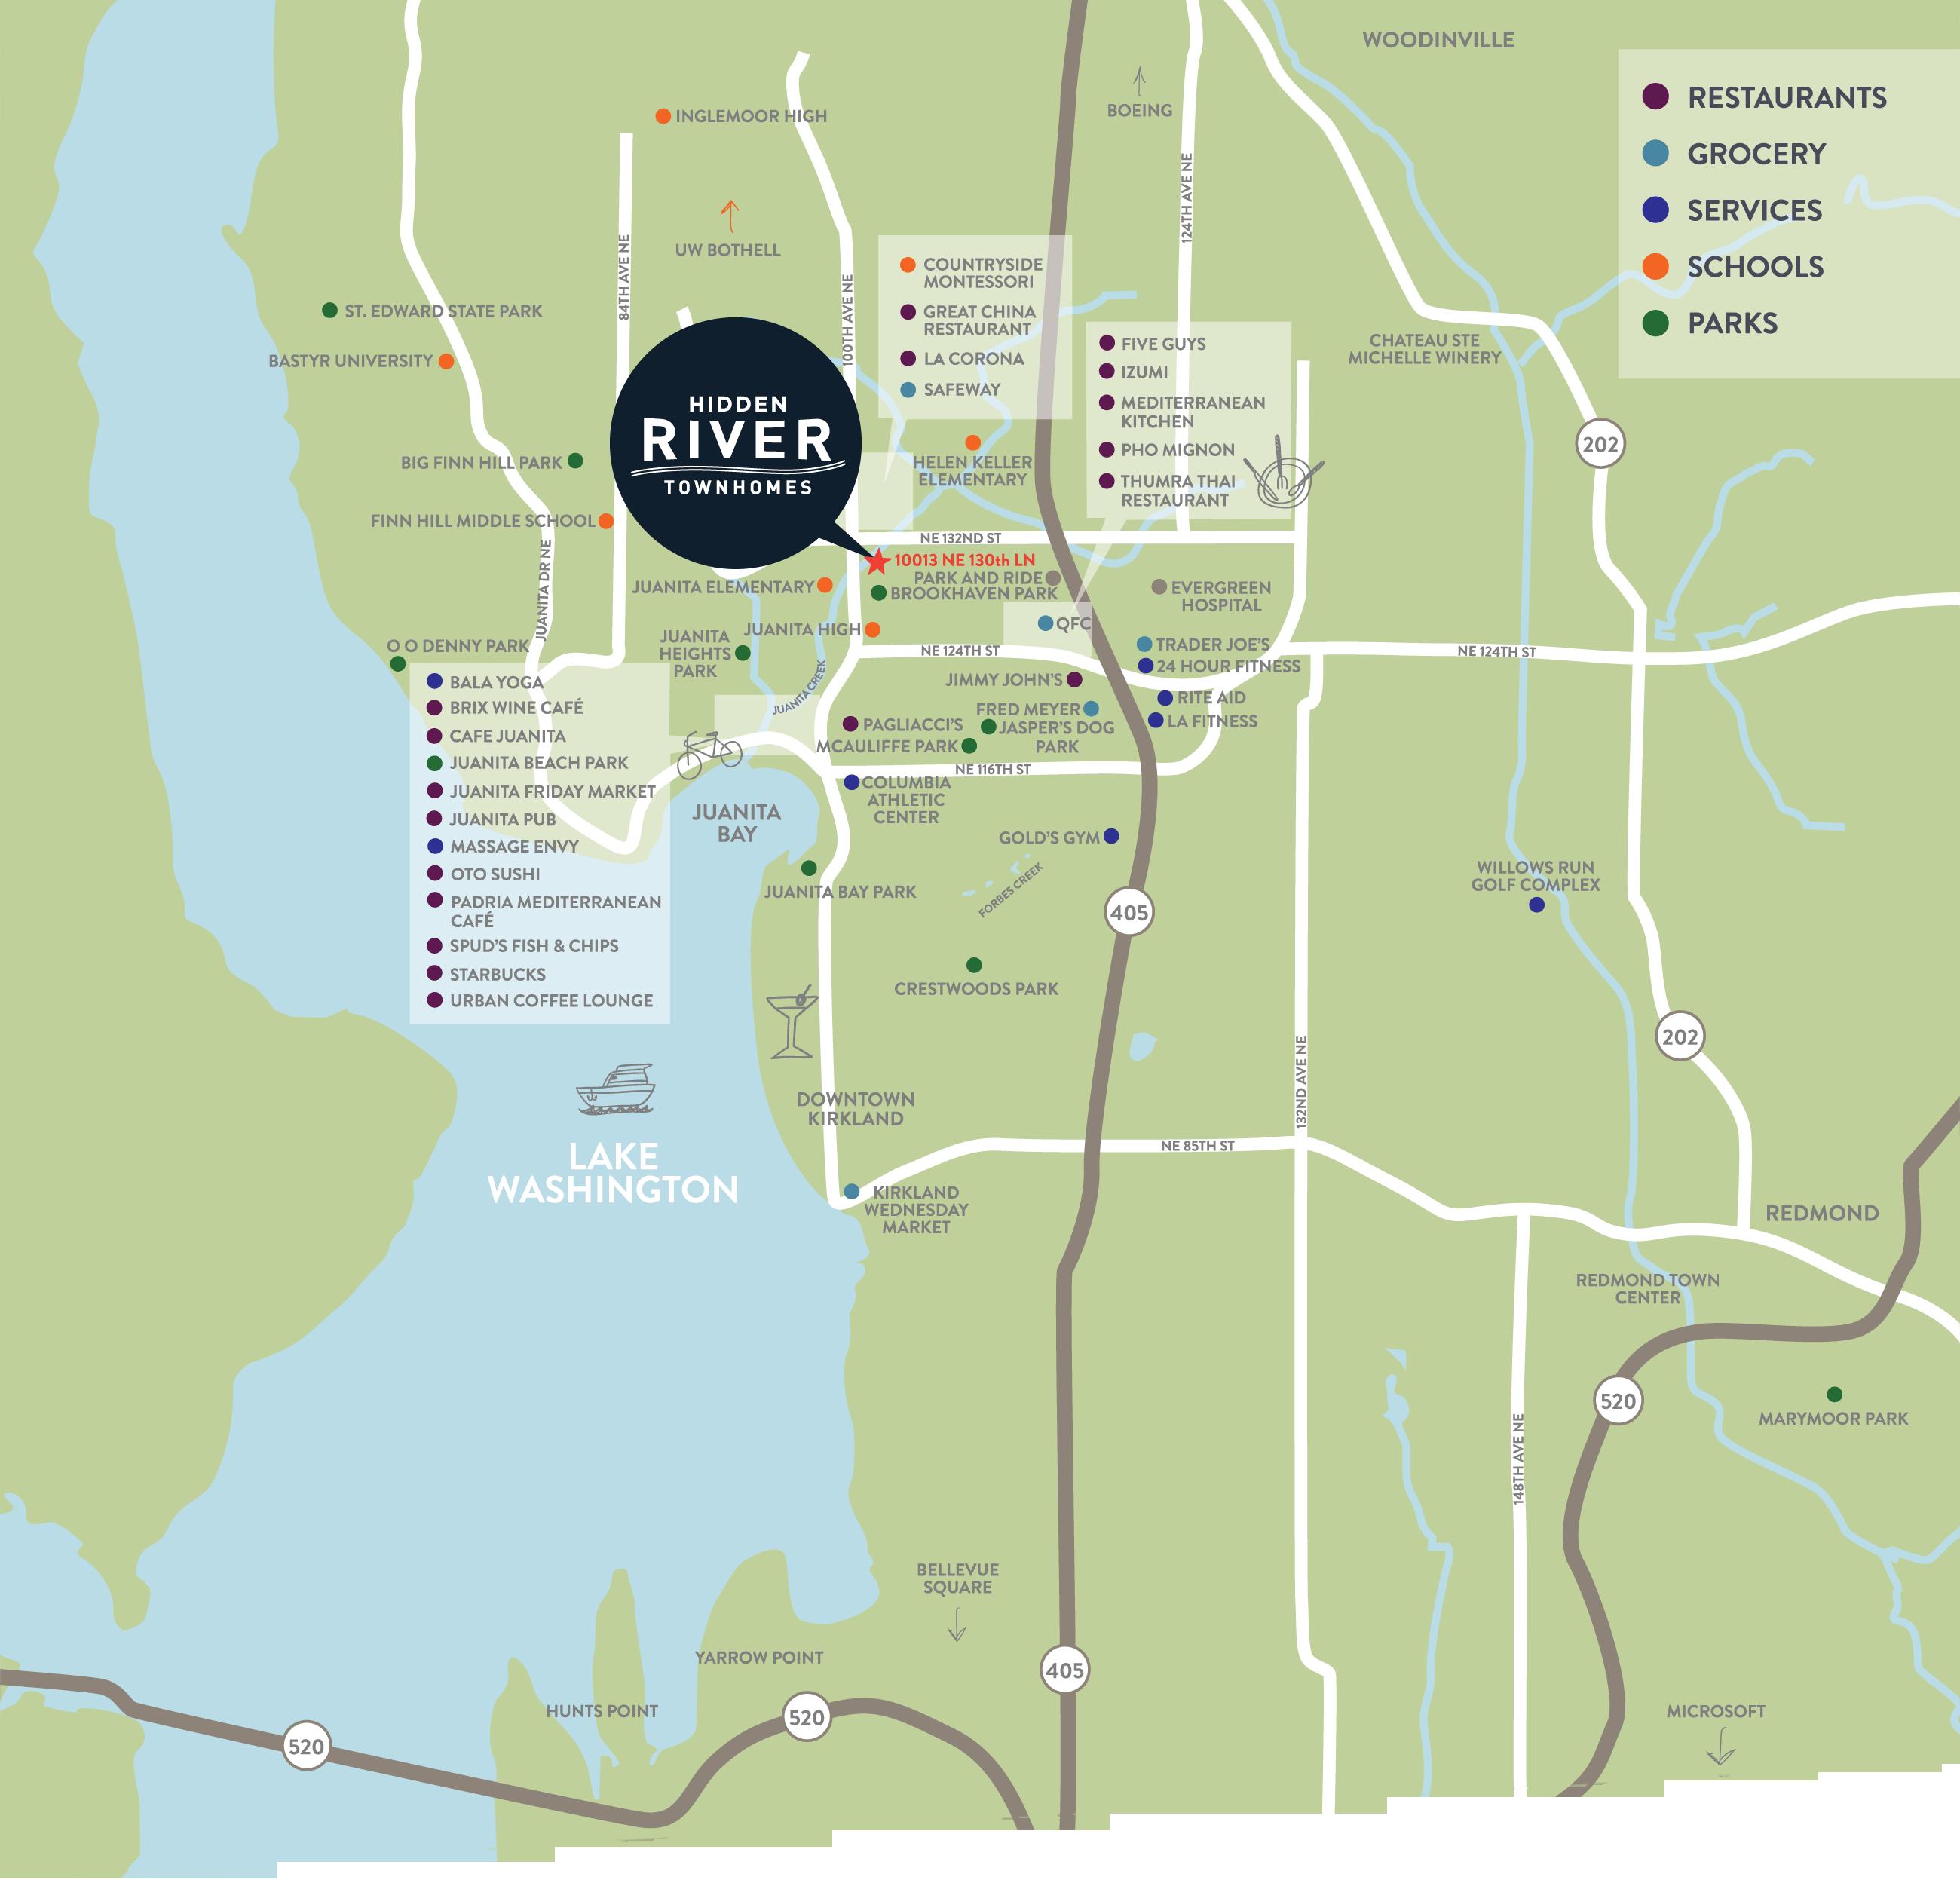 Location Map - Hidden River Townhomes, Apartments near Juanita Bay, Kirkland, Washington 98034